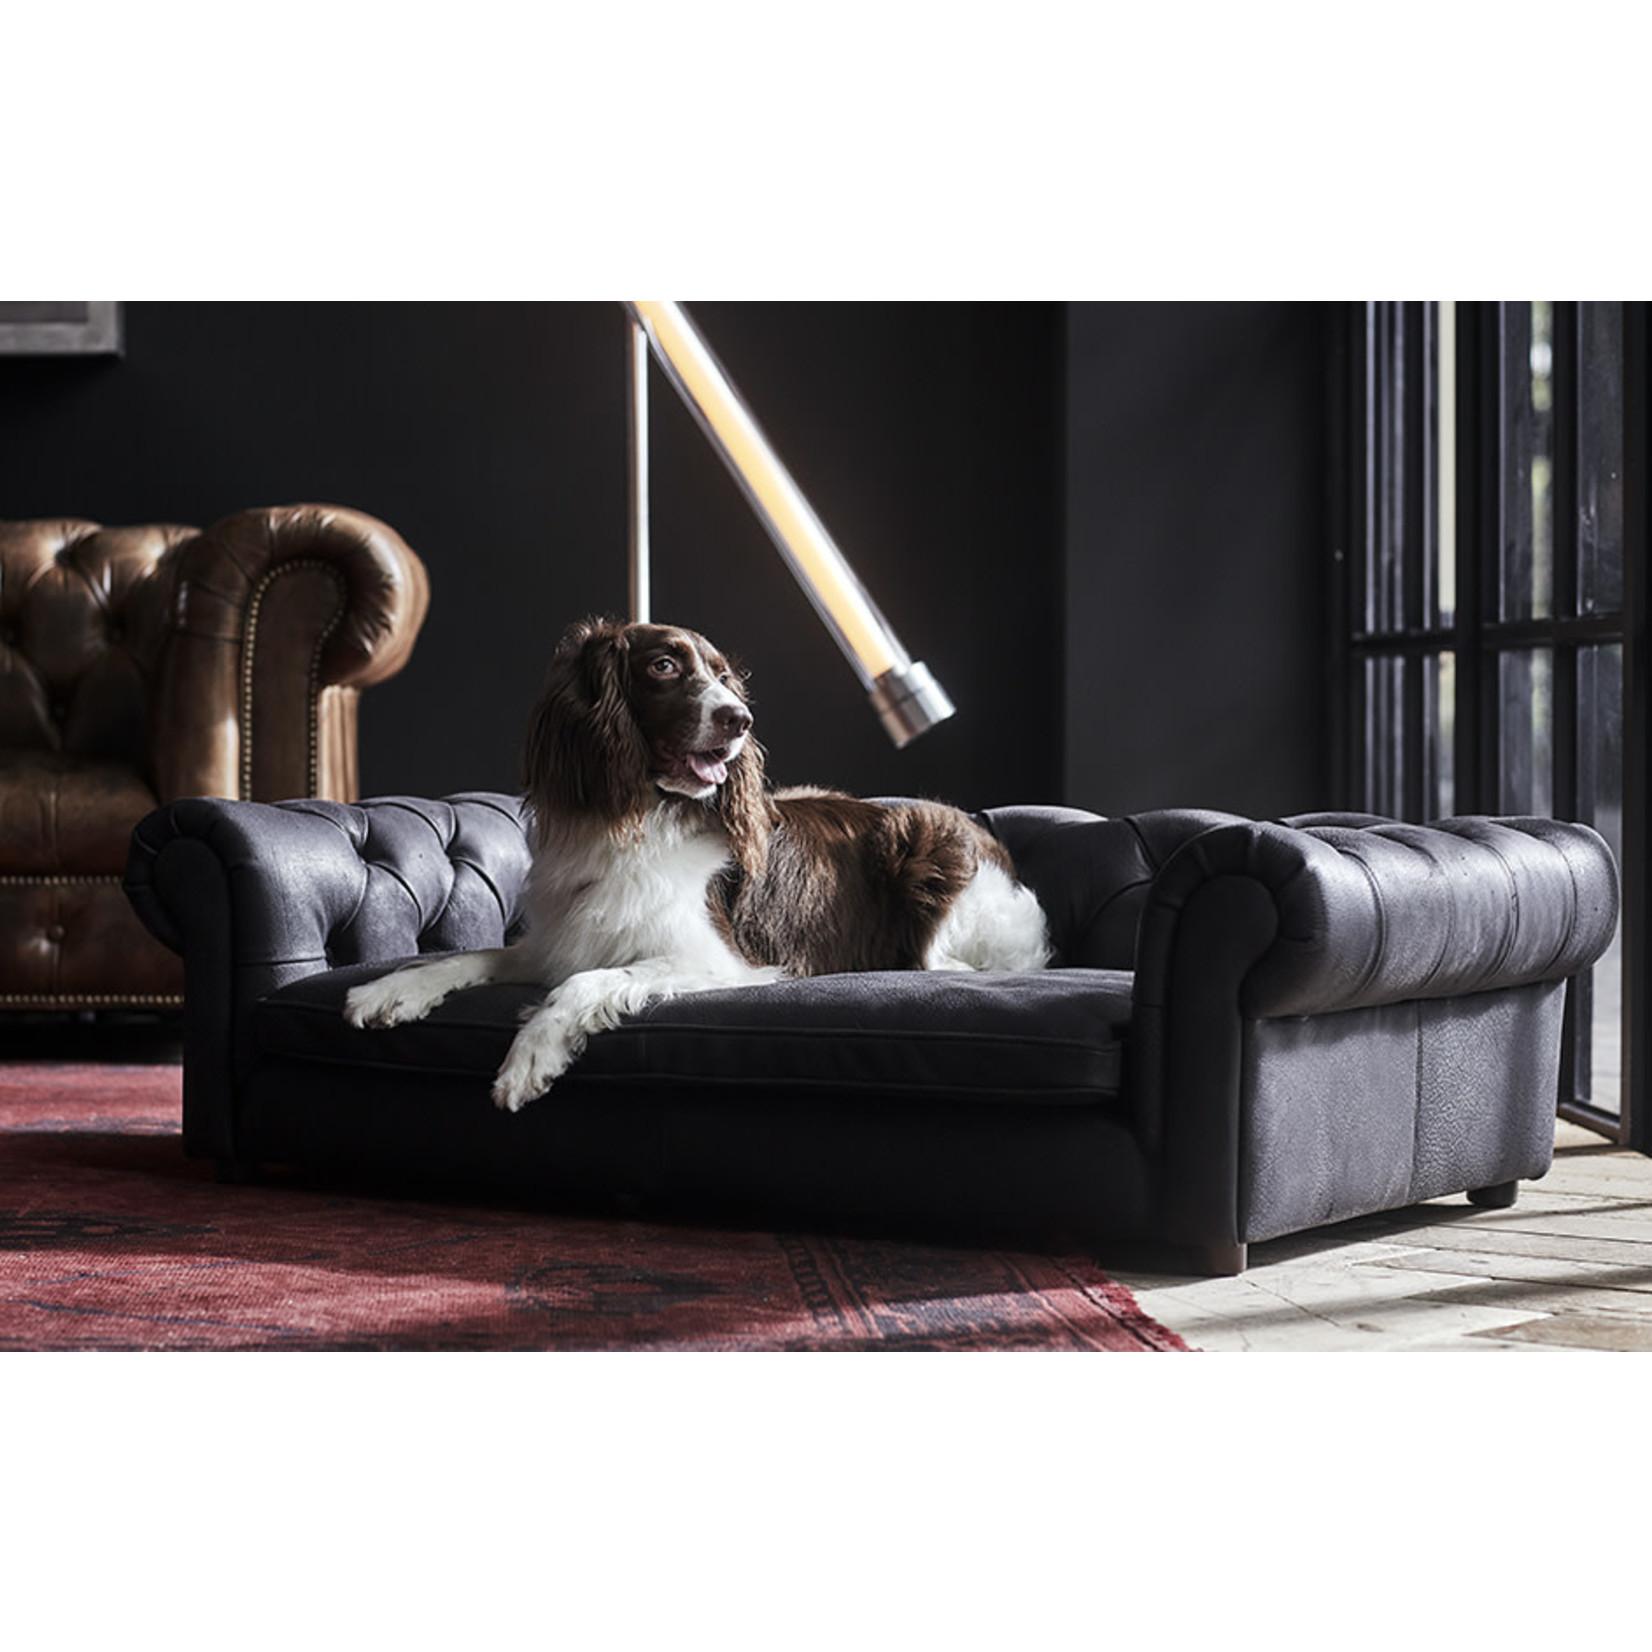 TIMOTHY OULTON TO WESTMINSTER DOG BED SAFARI BLACK